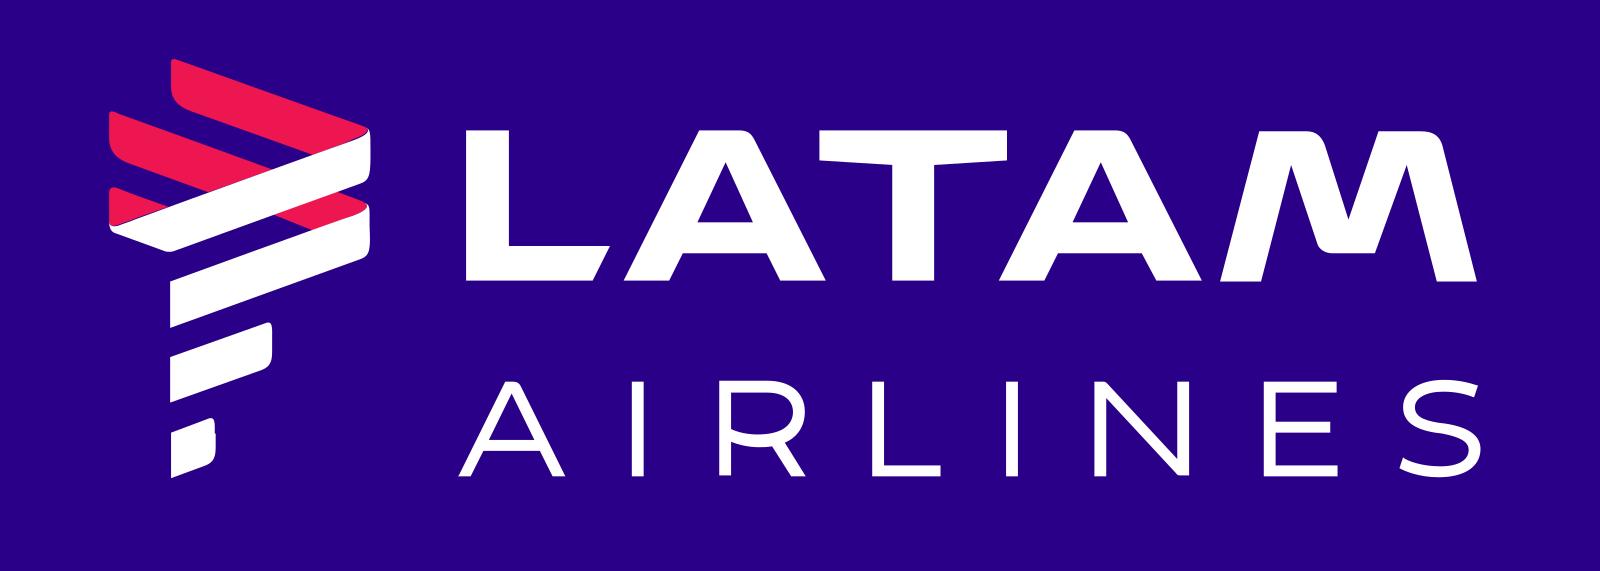 latam logo 10 - Latam Airlines Logo